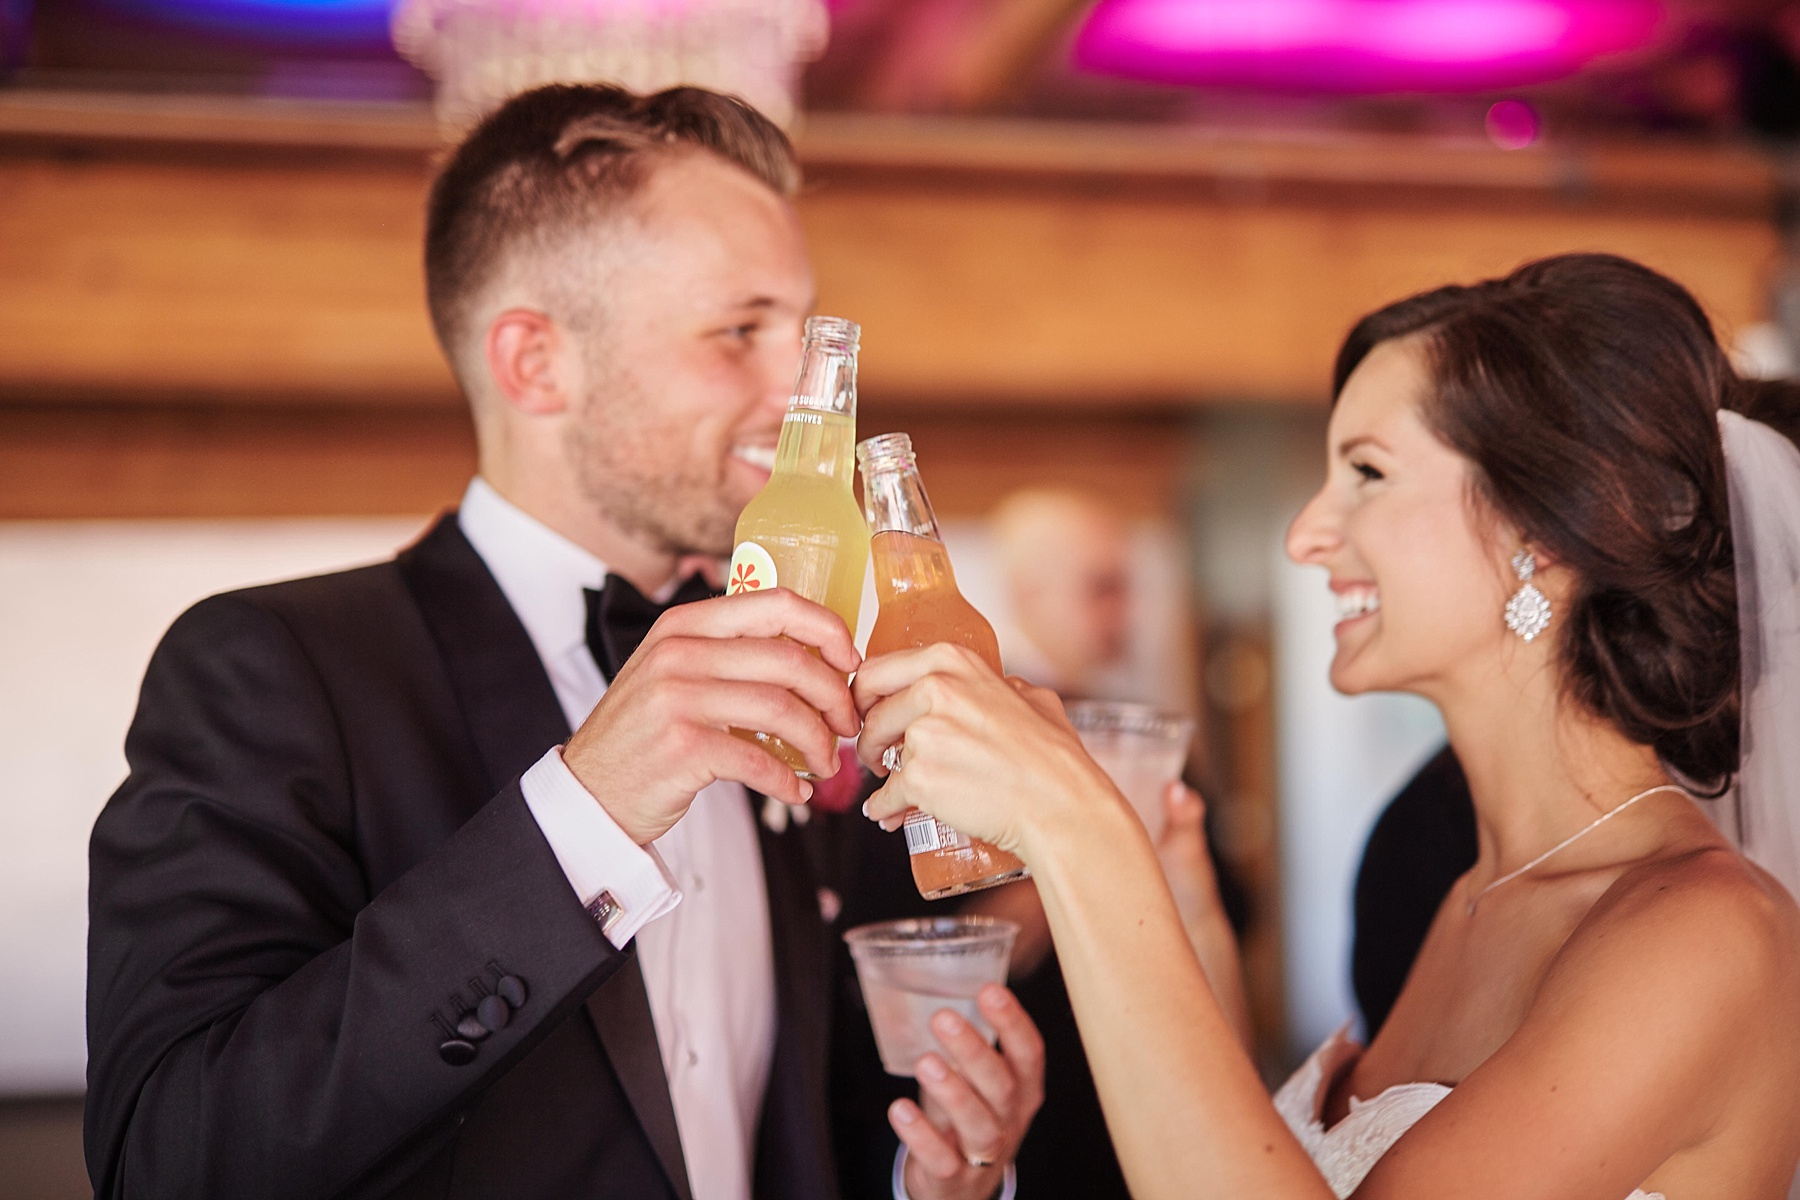 ABULAE-Wedding-Saint-paul-MN-Josh-Sofia-Wedding-Mears-Park_0779.jpg